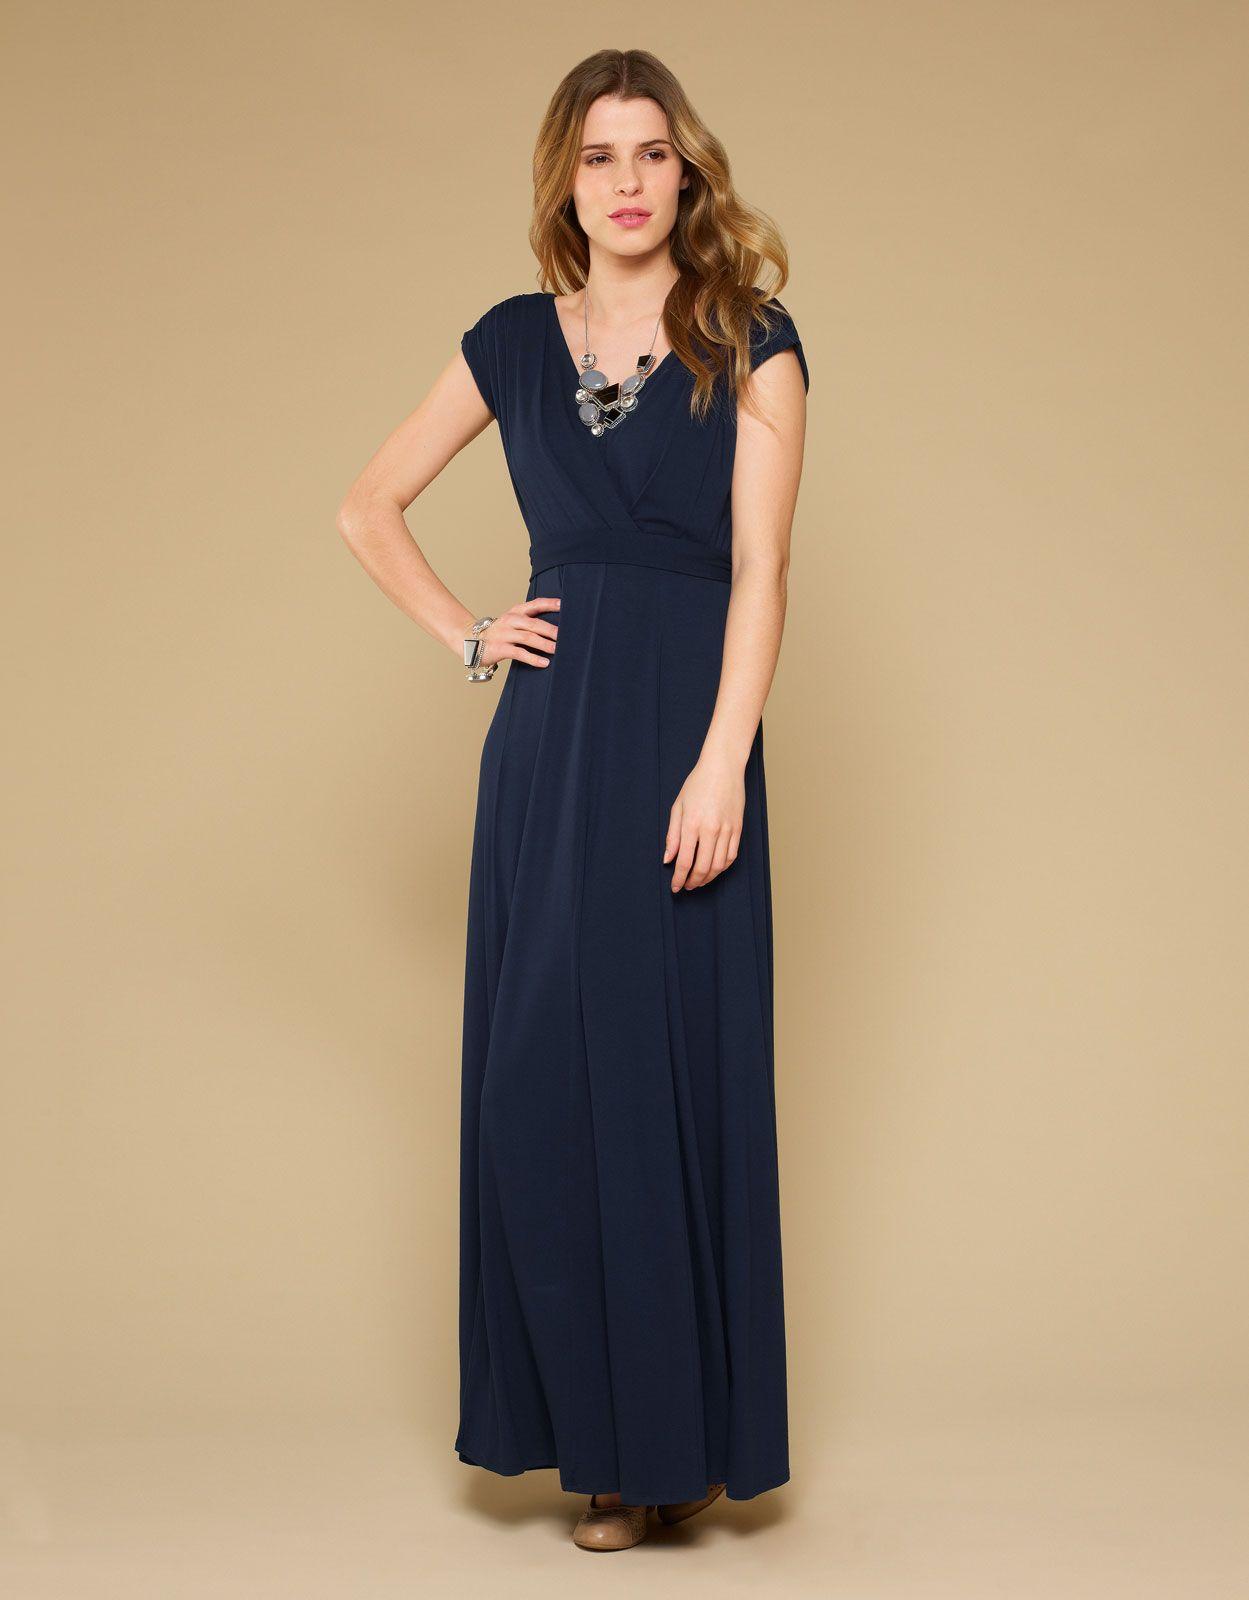 Paityn Plain Maxi Dress | e&c | Pinterest | Maxi dresses, Monsoon ...